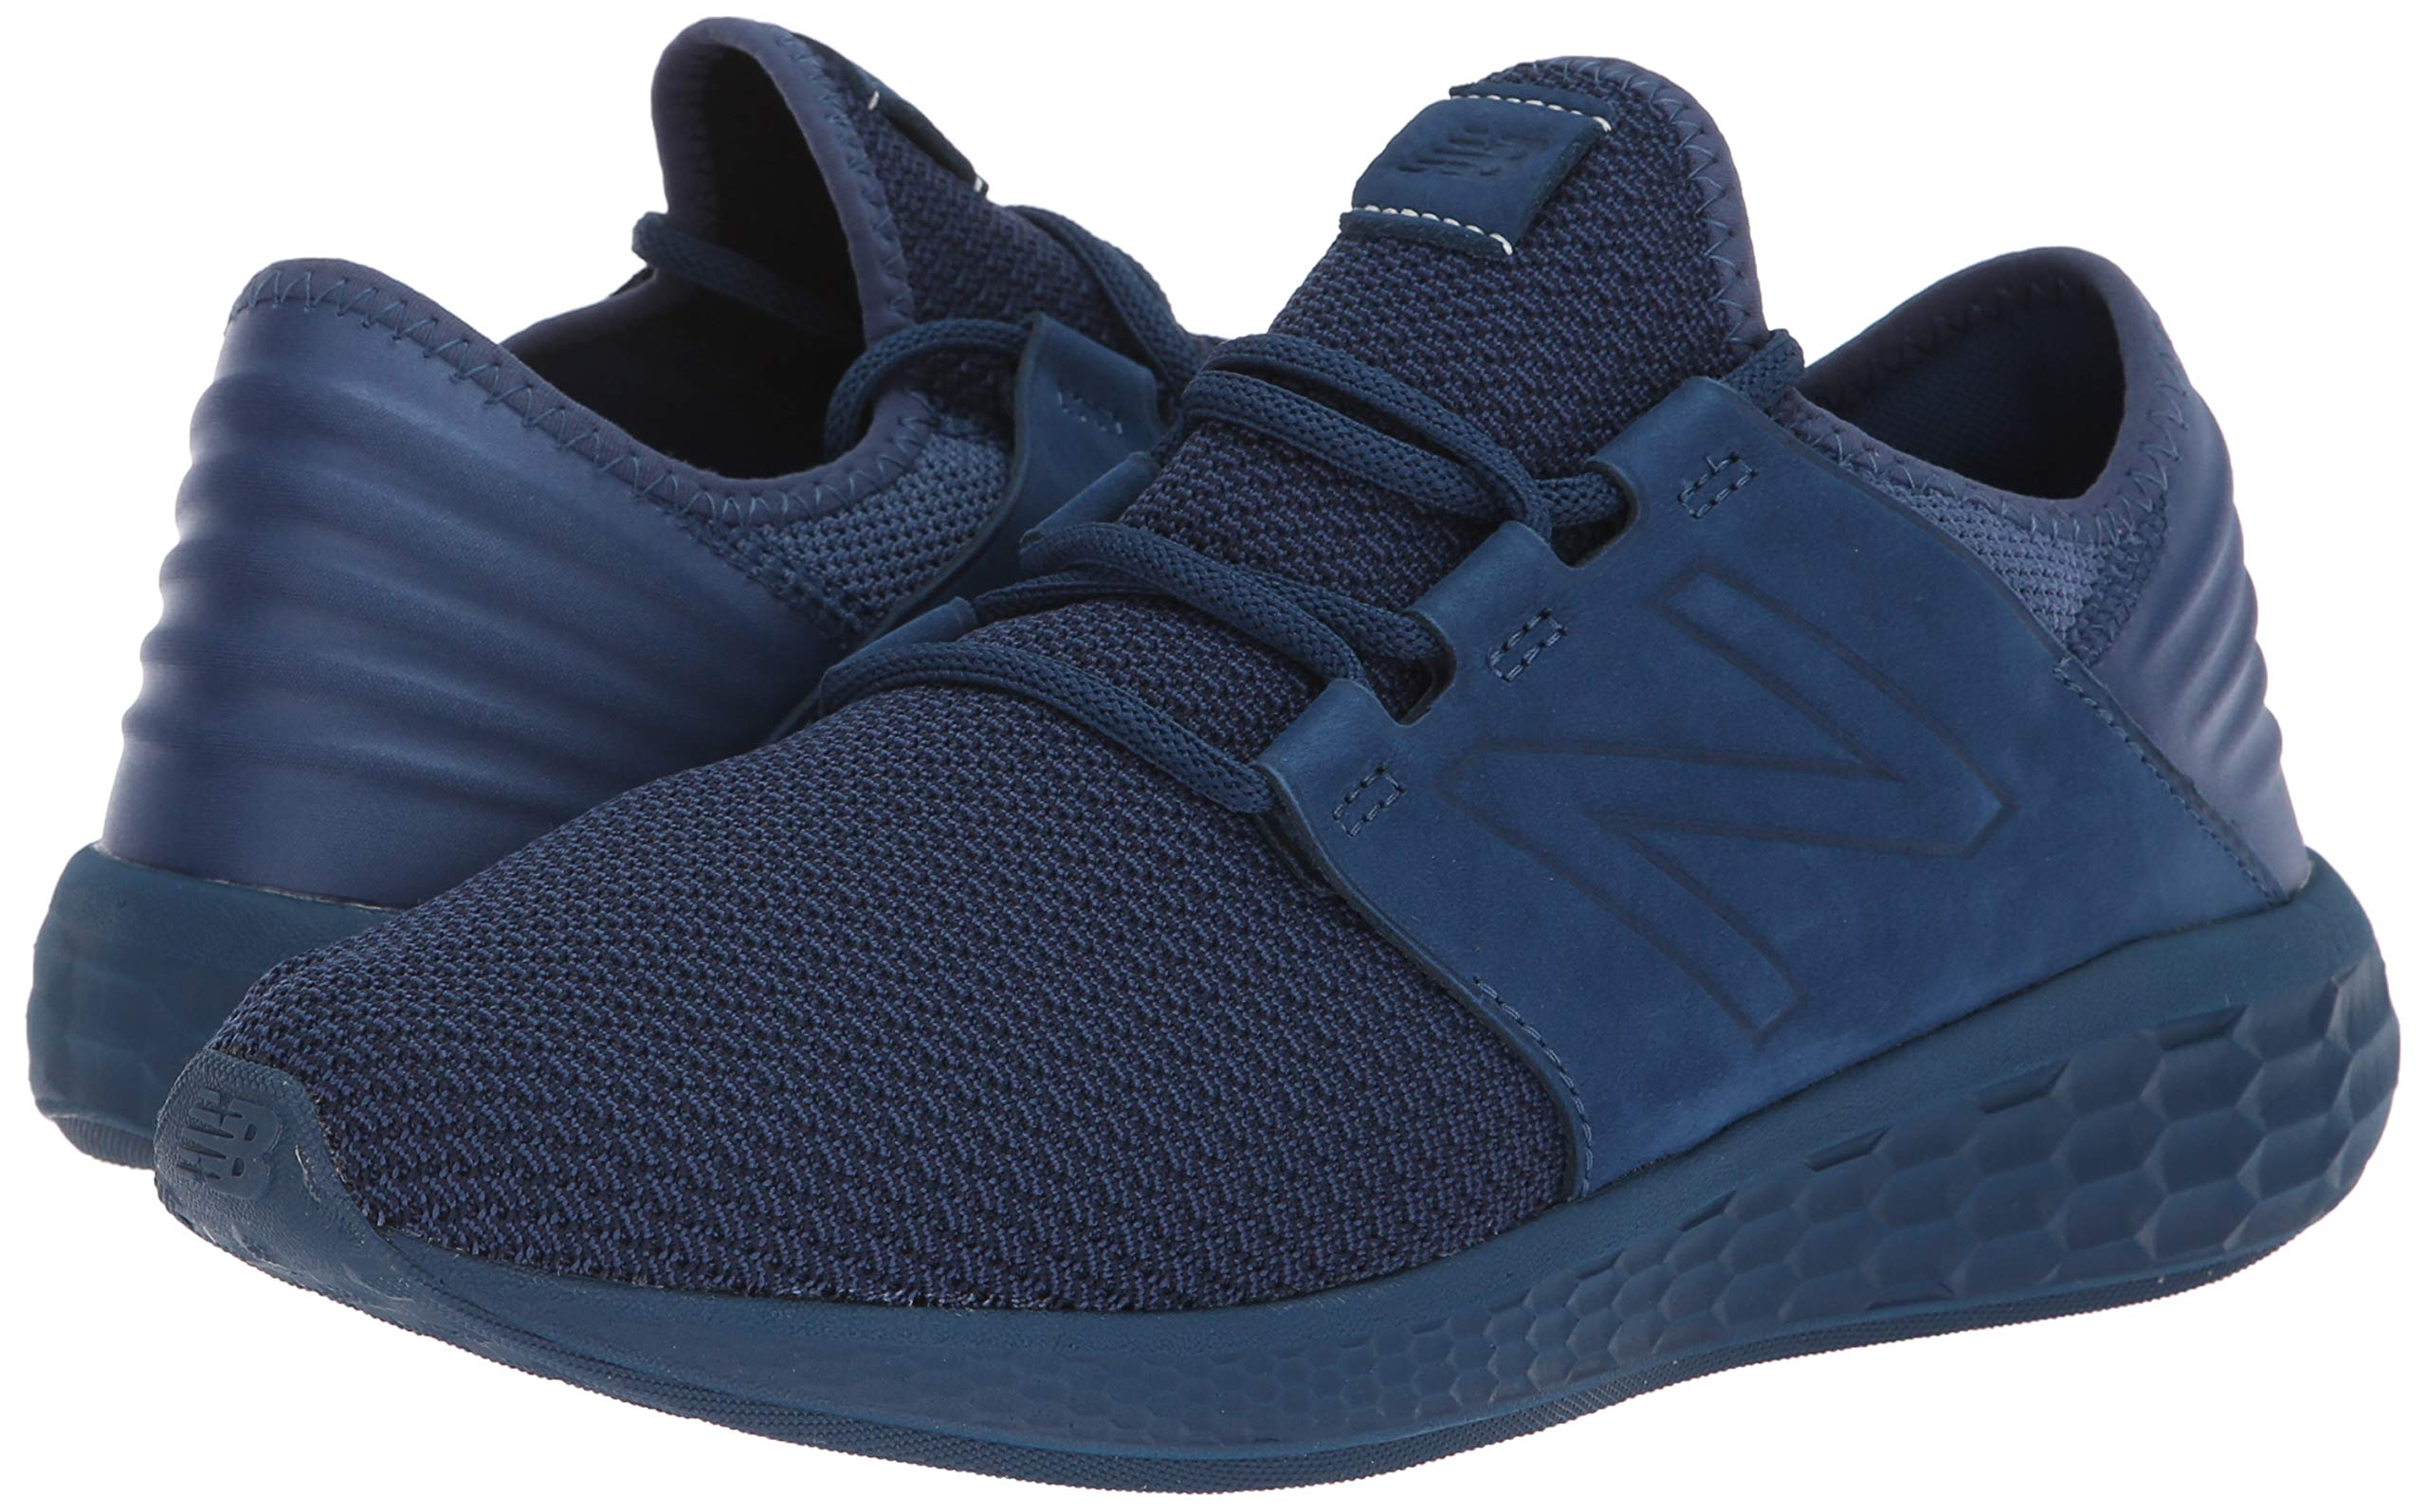 New Balance Men's Cruz V2 Fresh Foam Running Shoe, moroccan tile, 7 D US by New Balance (Image #5)